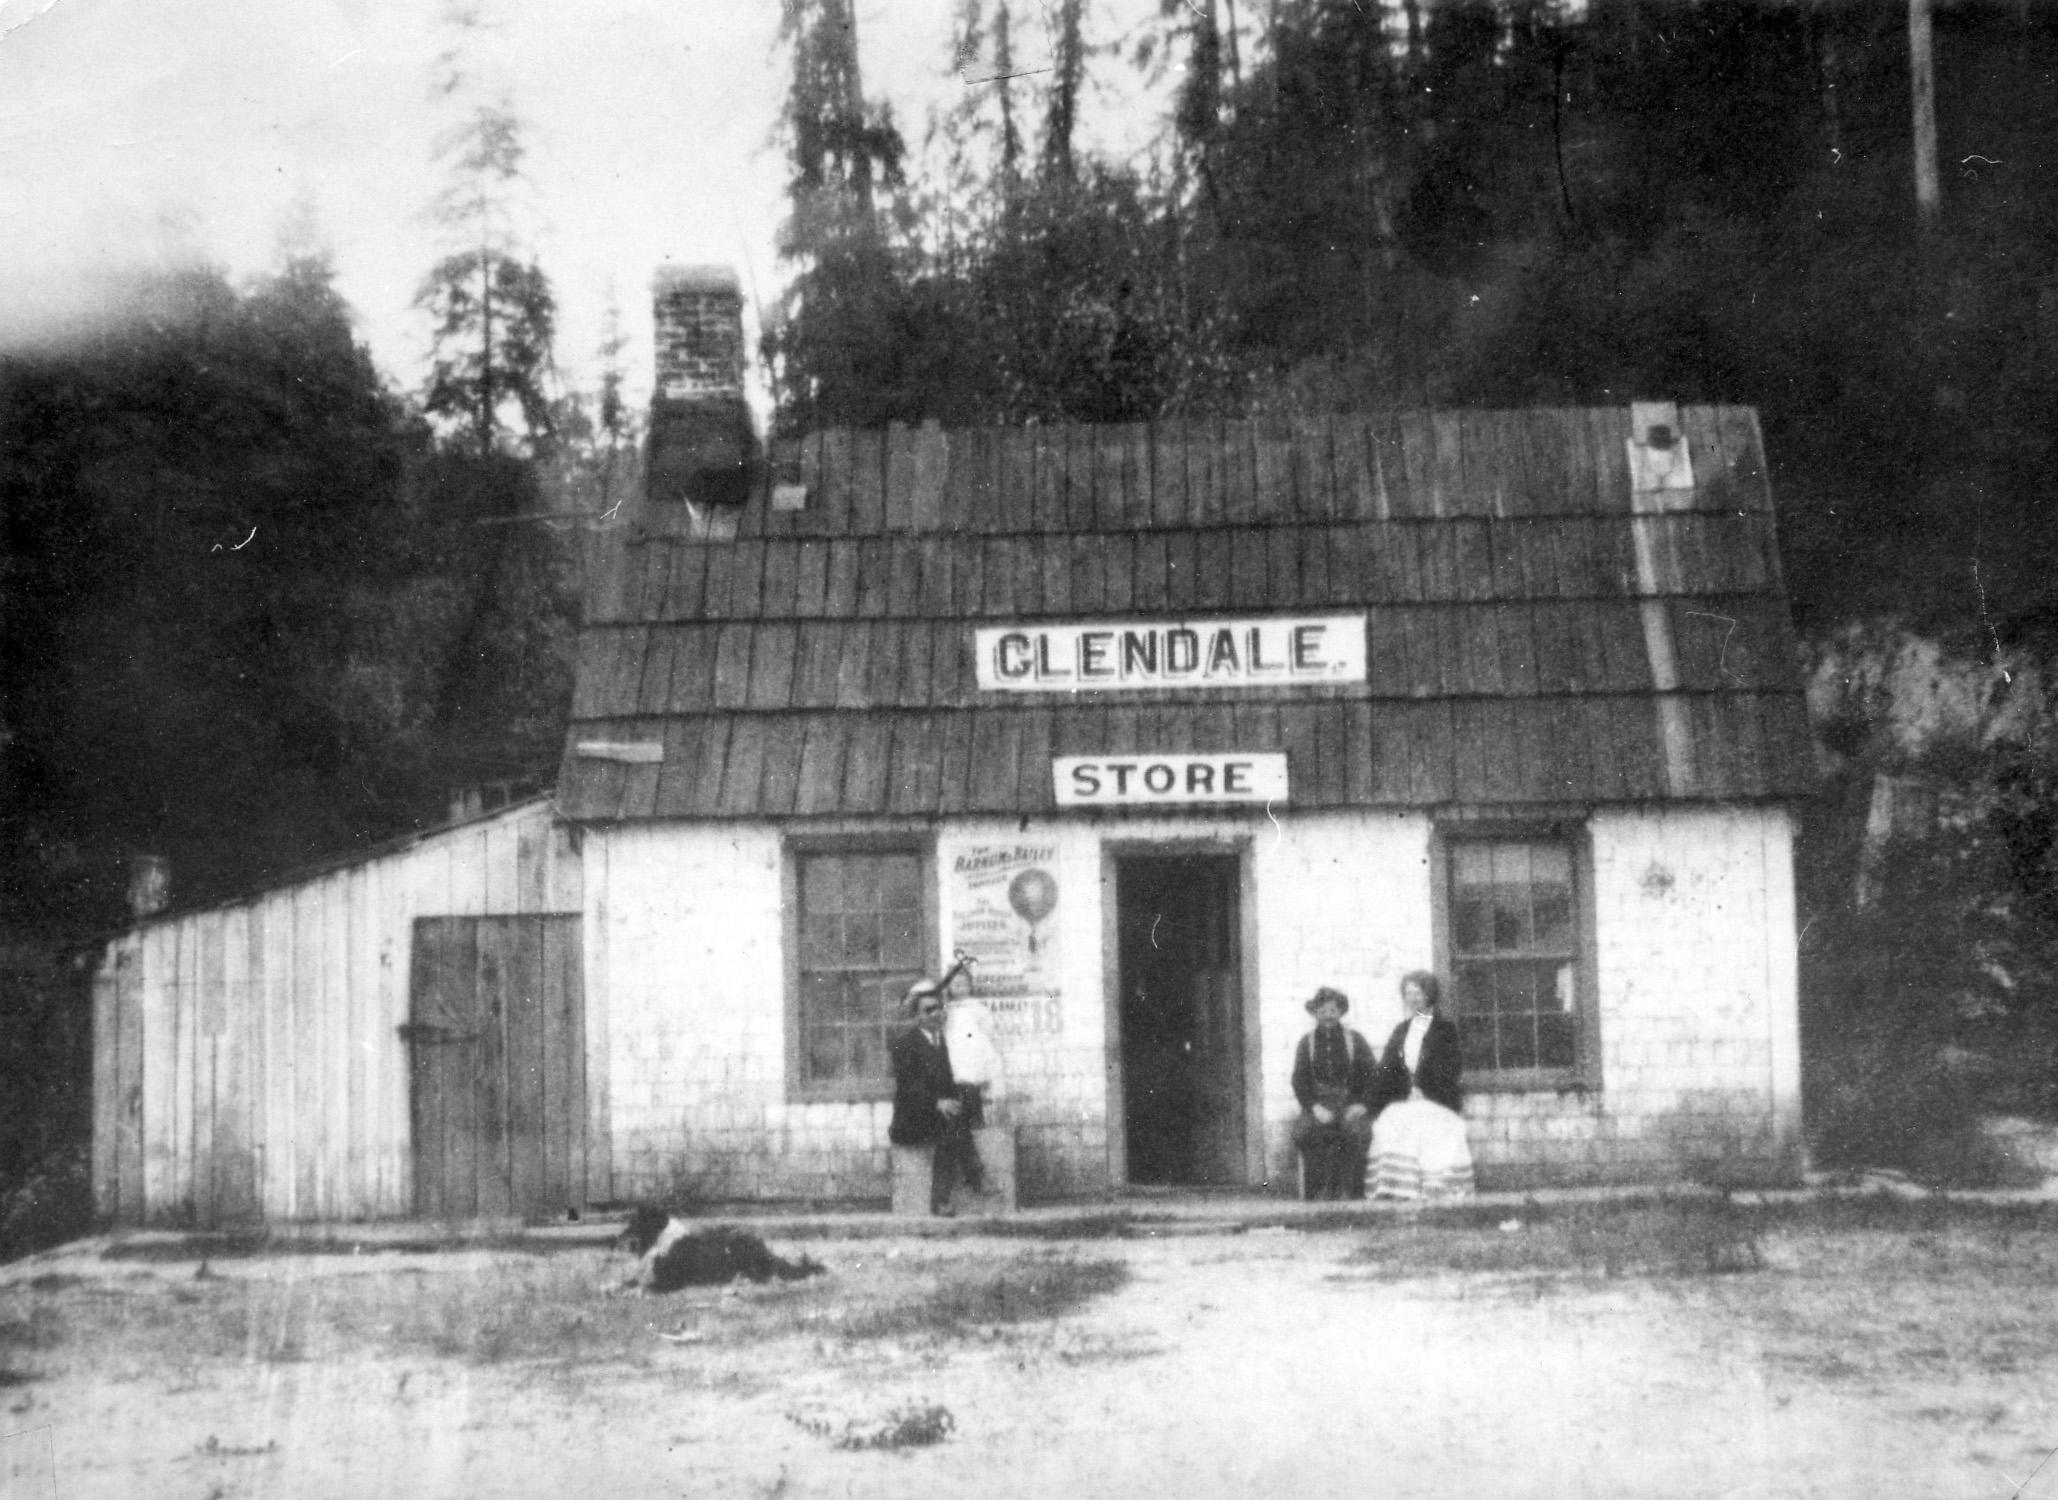 Glendale Store